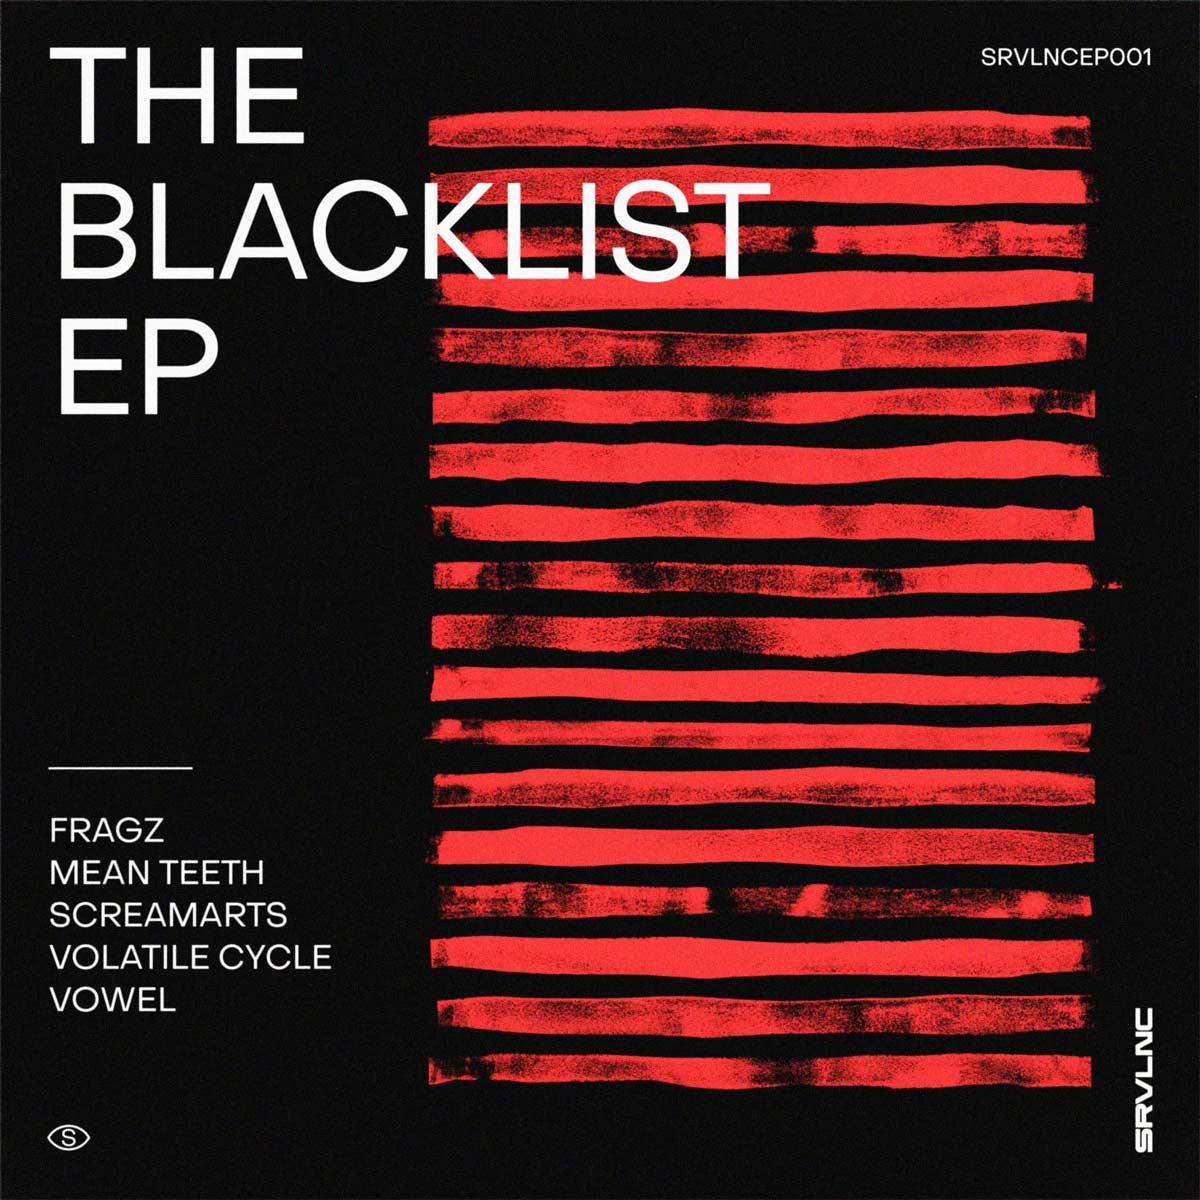 Umut präsentiert: VA – The Blacklist EP [SRVLNCEP001]